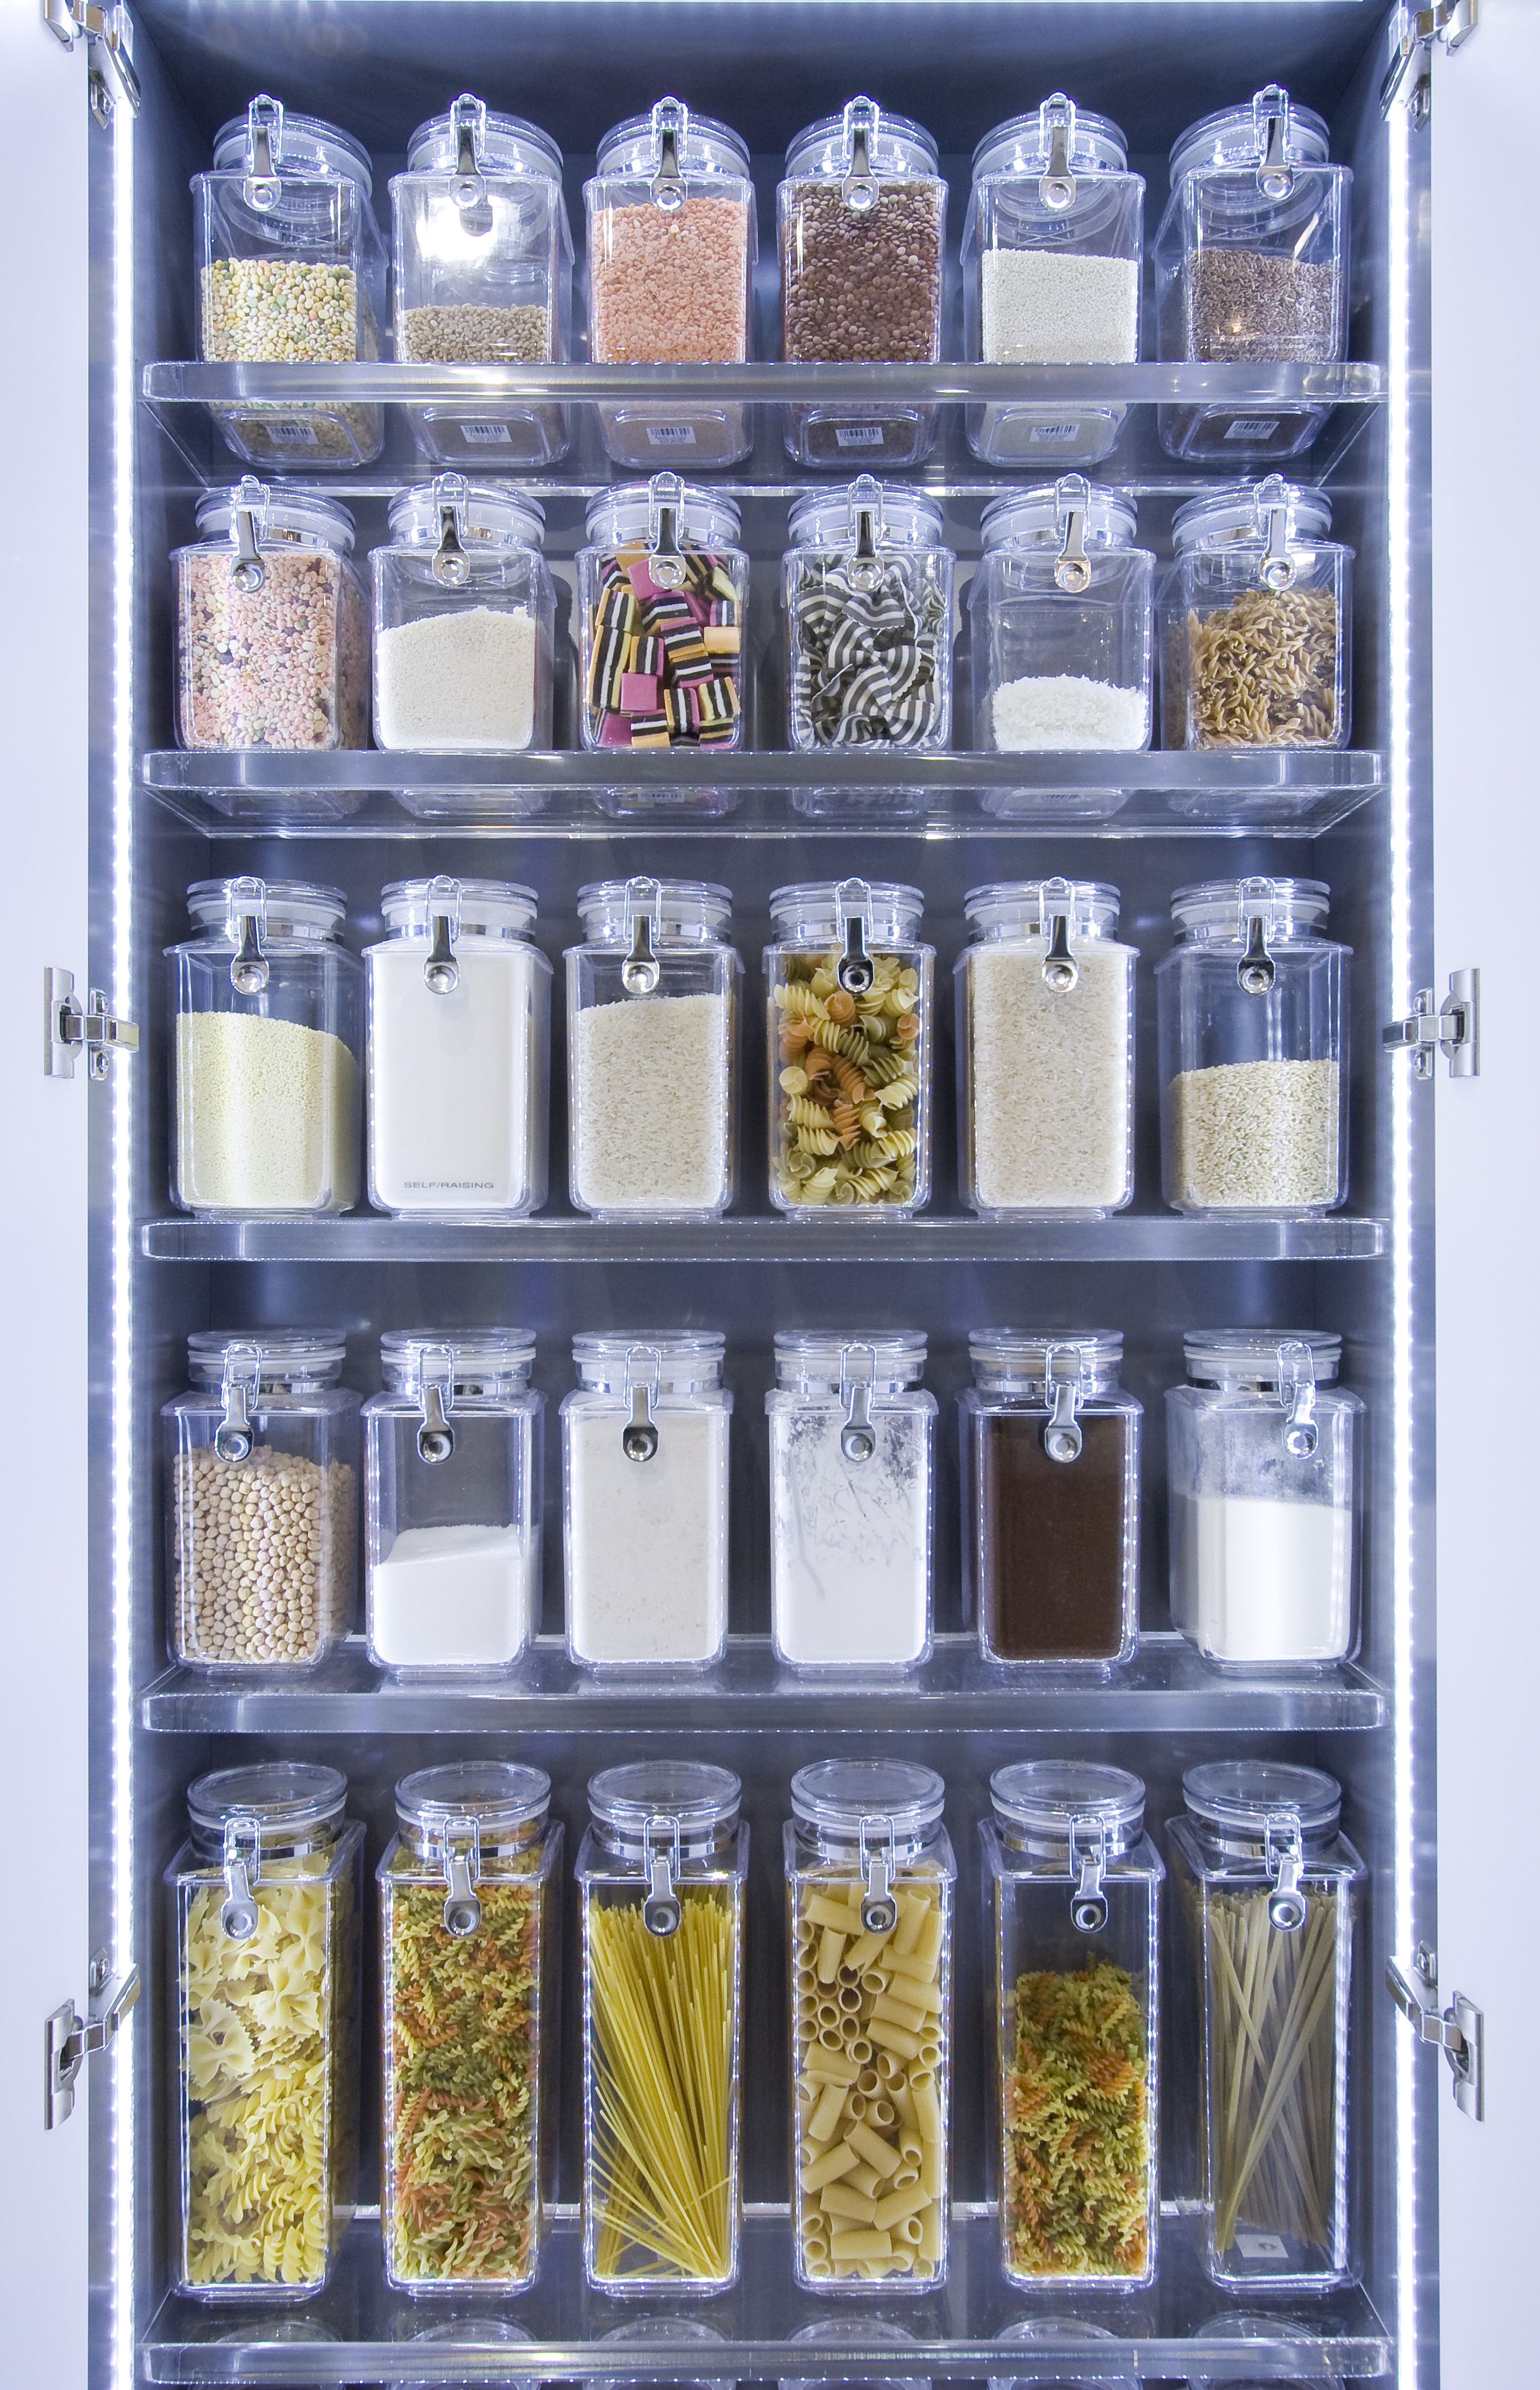 Garsden & Clarke Decor, Pantry, Kitchen #Interiordesign #Decor #Food #